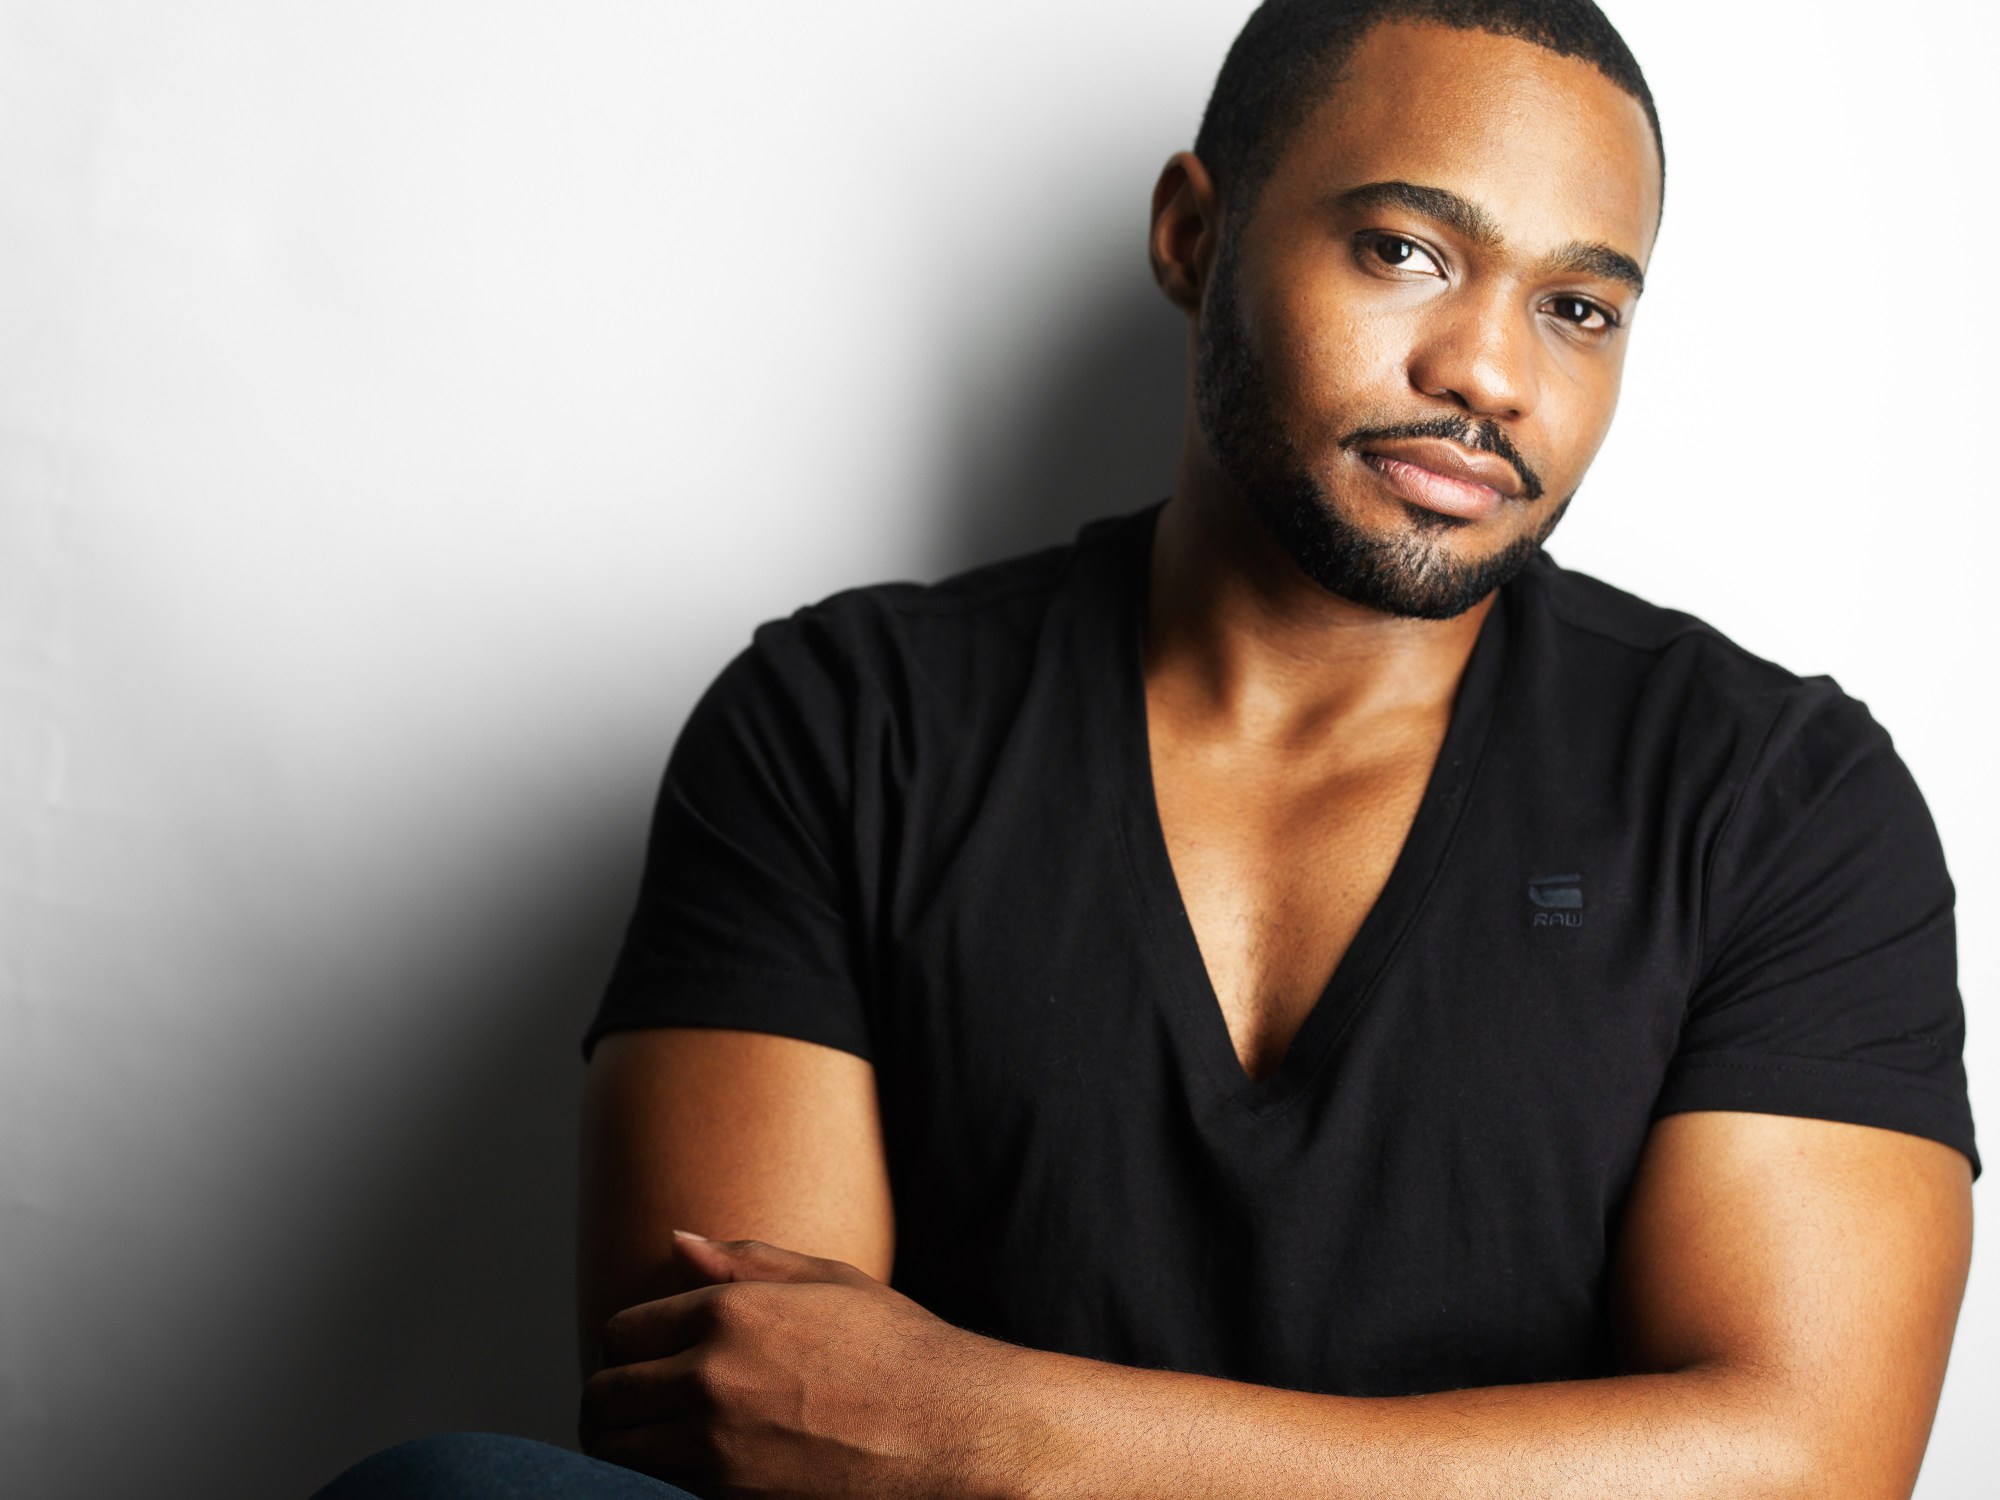 Celebrity Musician producer brand ambassador Tyrone Smith Welcom